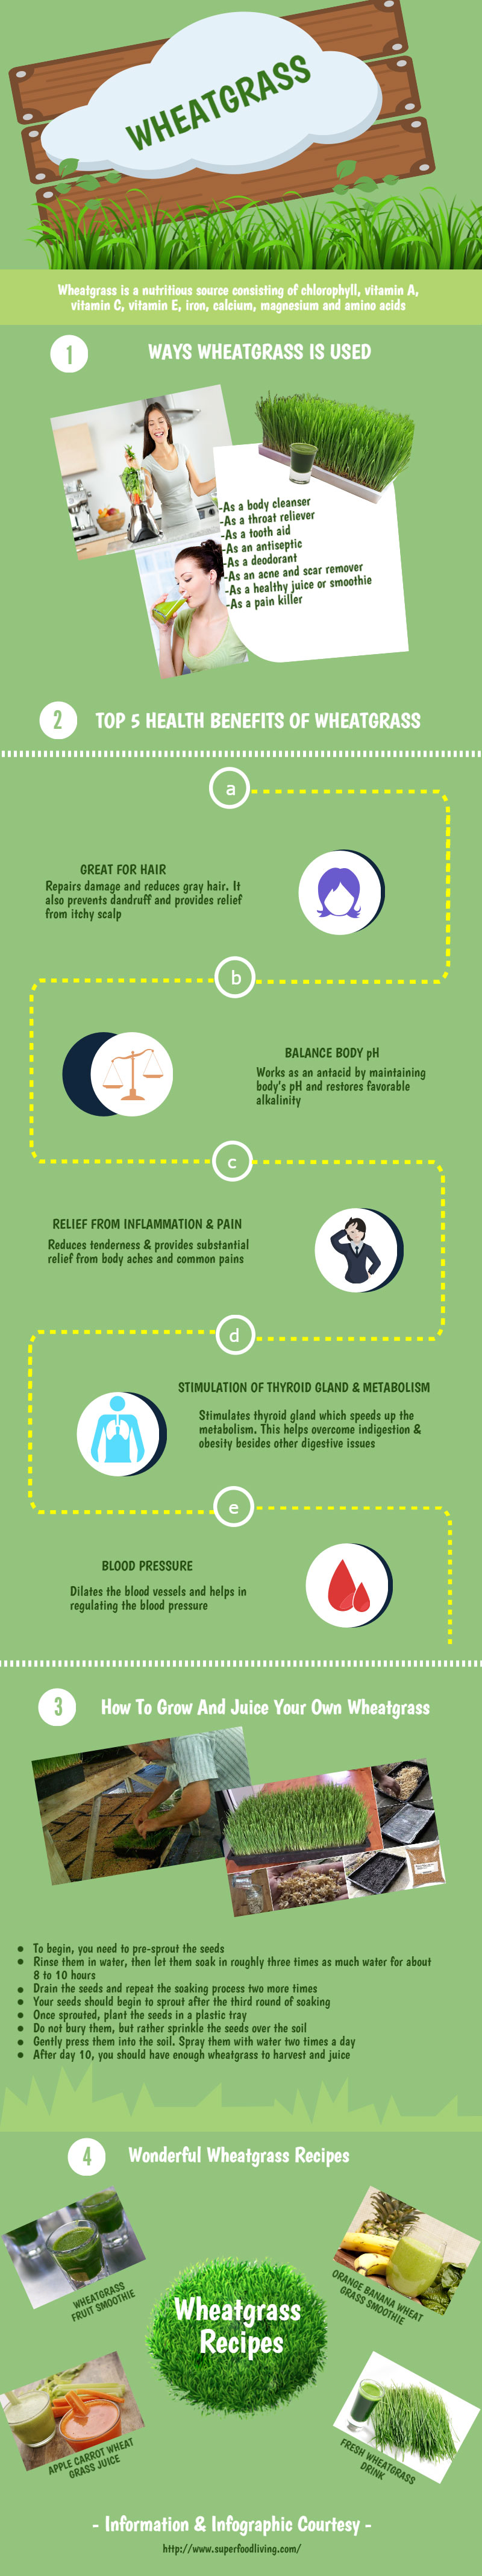 Wheatgrass Benefits Infographic